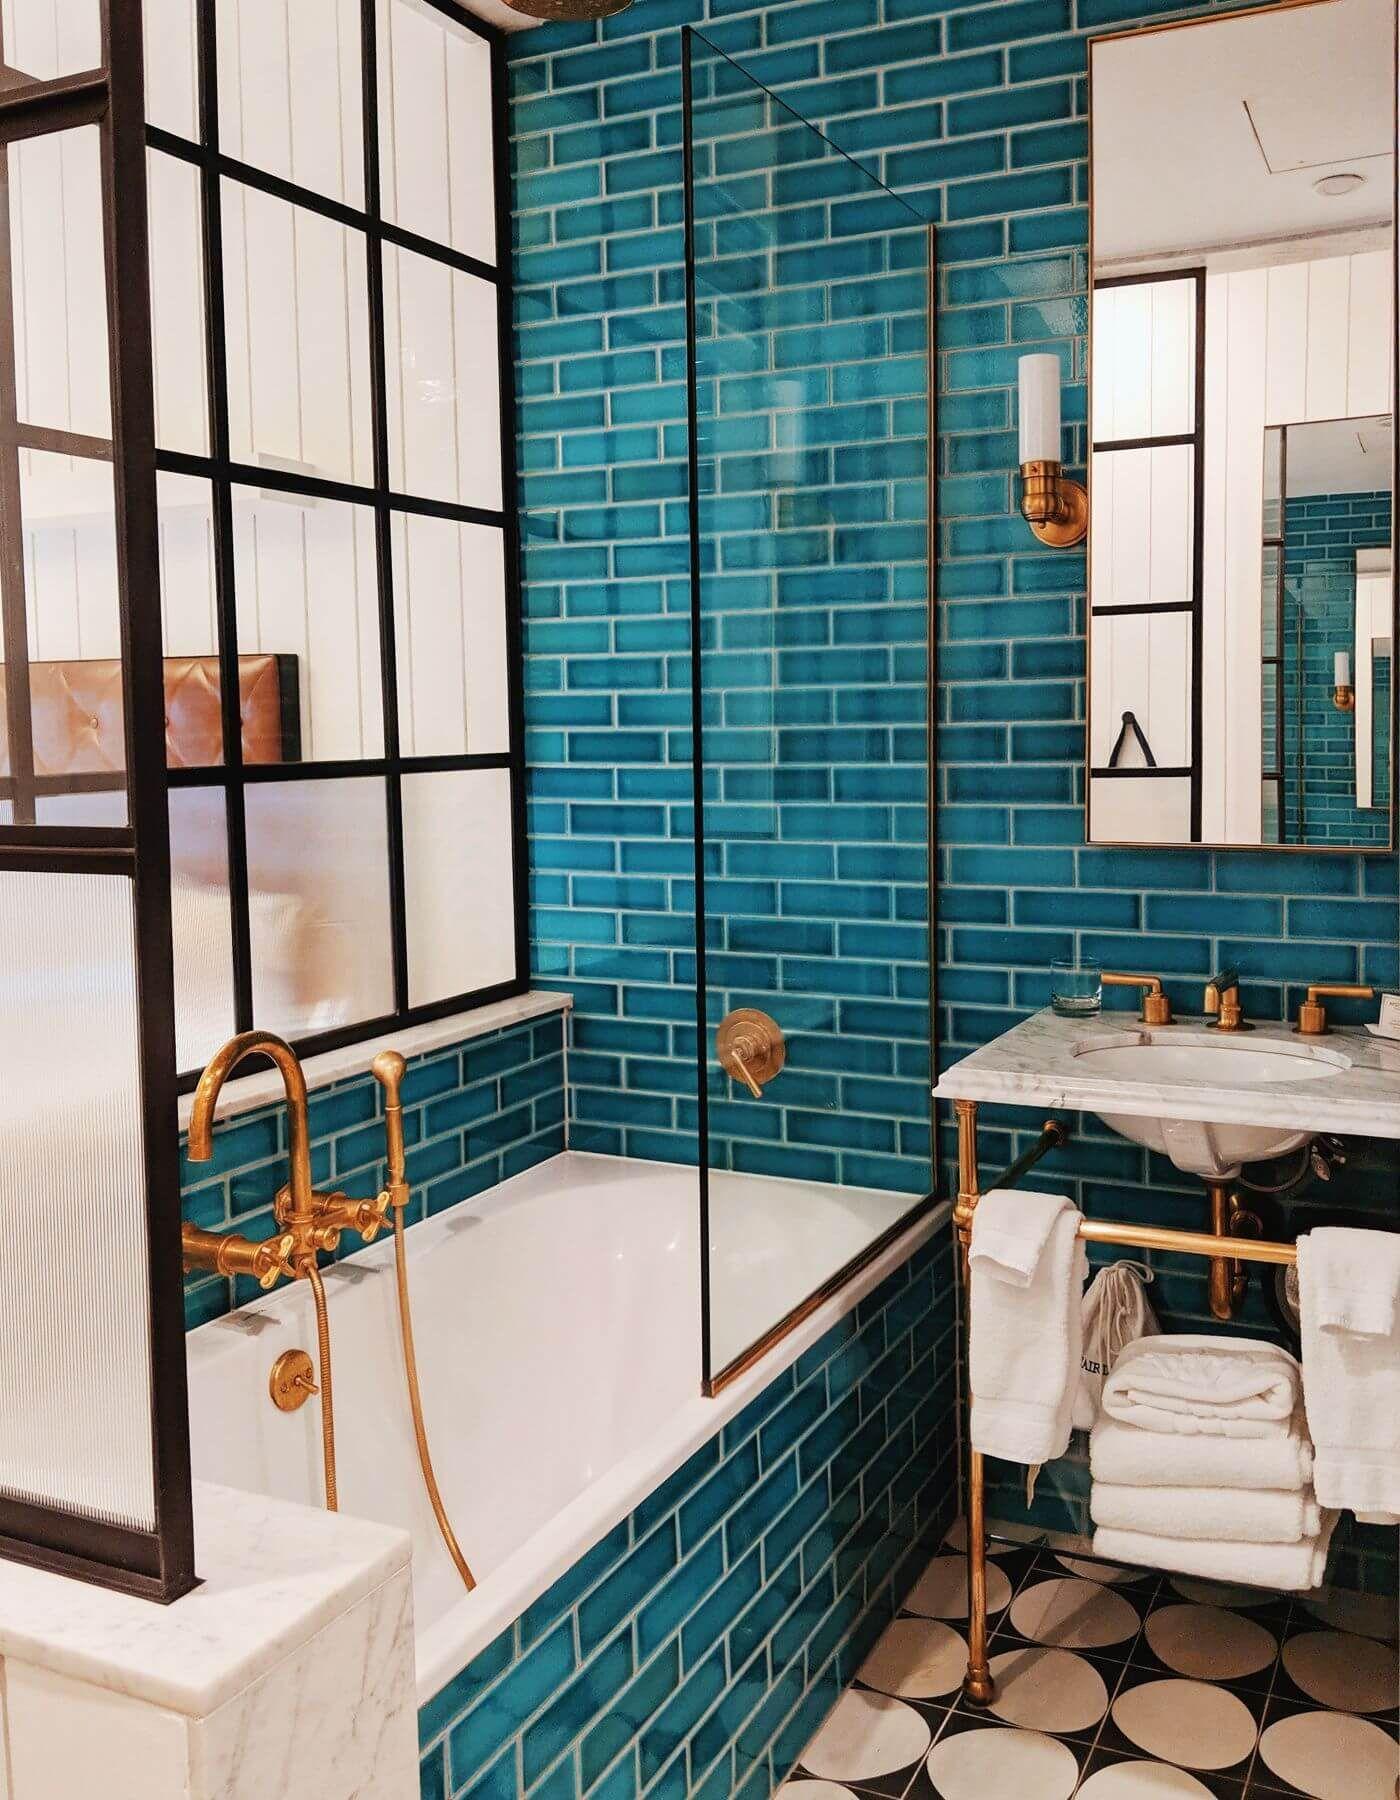 25 Eccentric Designs For Mid Century Modern Bathroom Bathroom Interior Bathroom Interior Design Bathroom Design